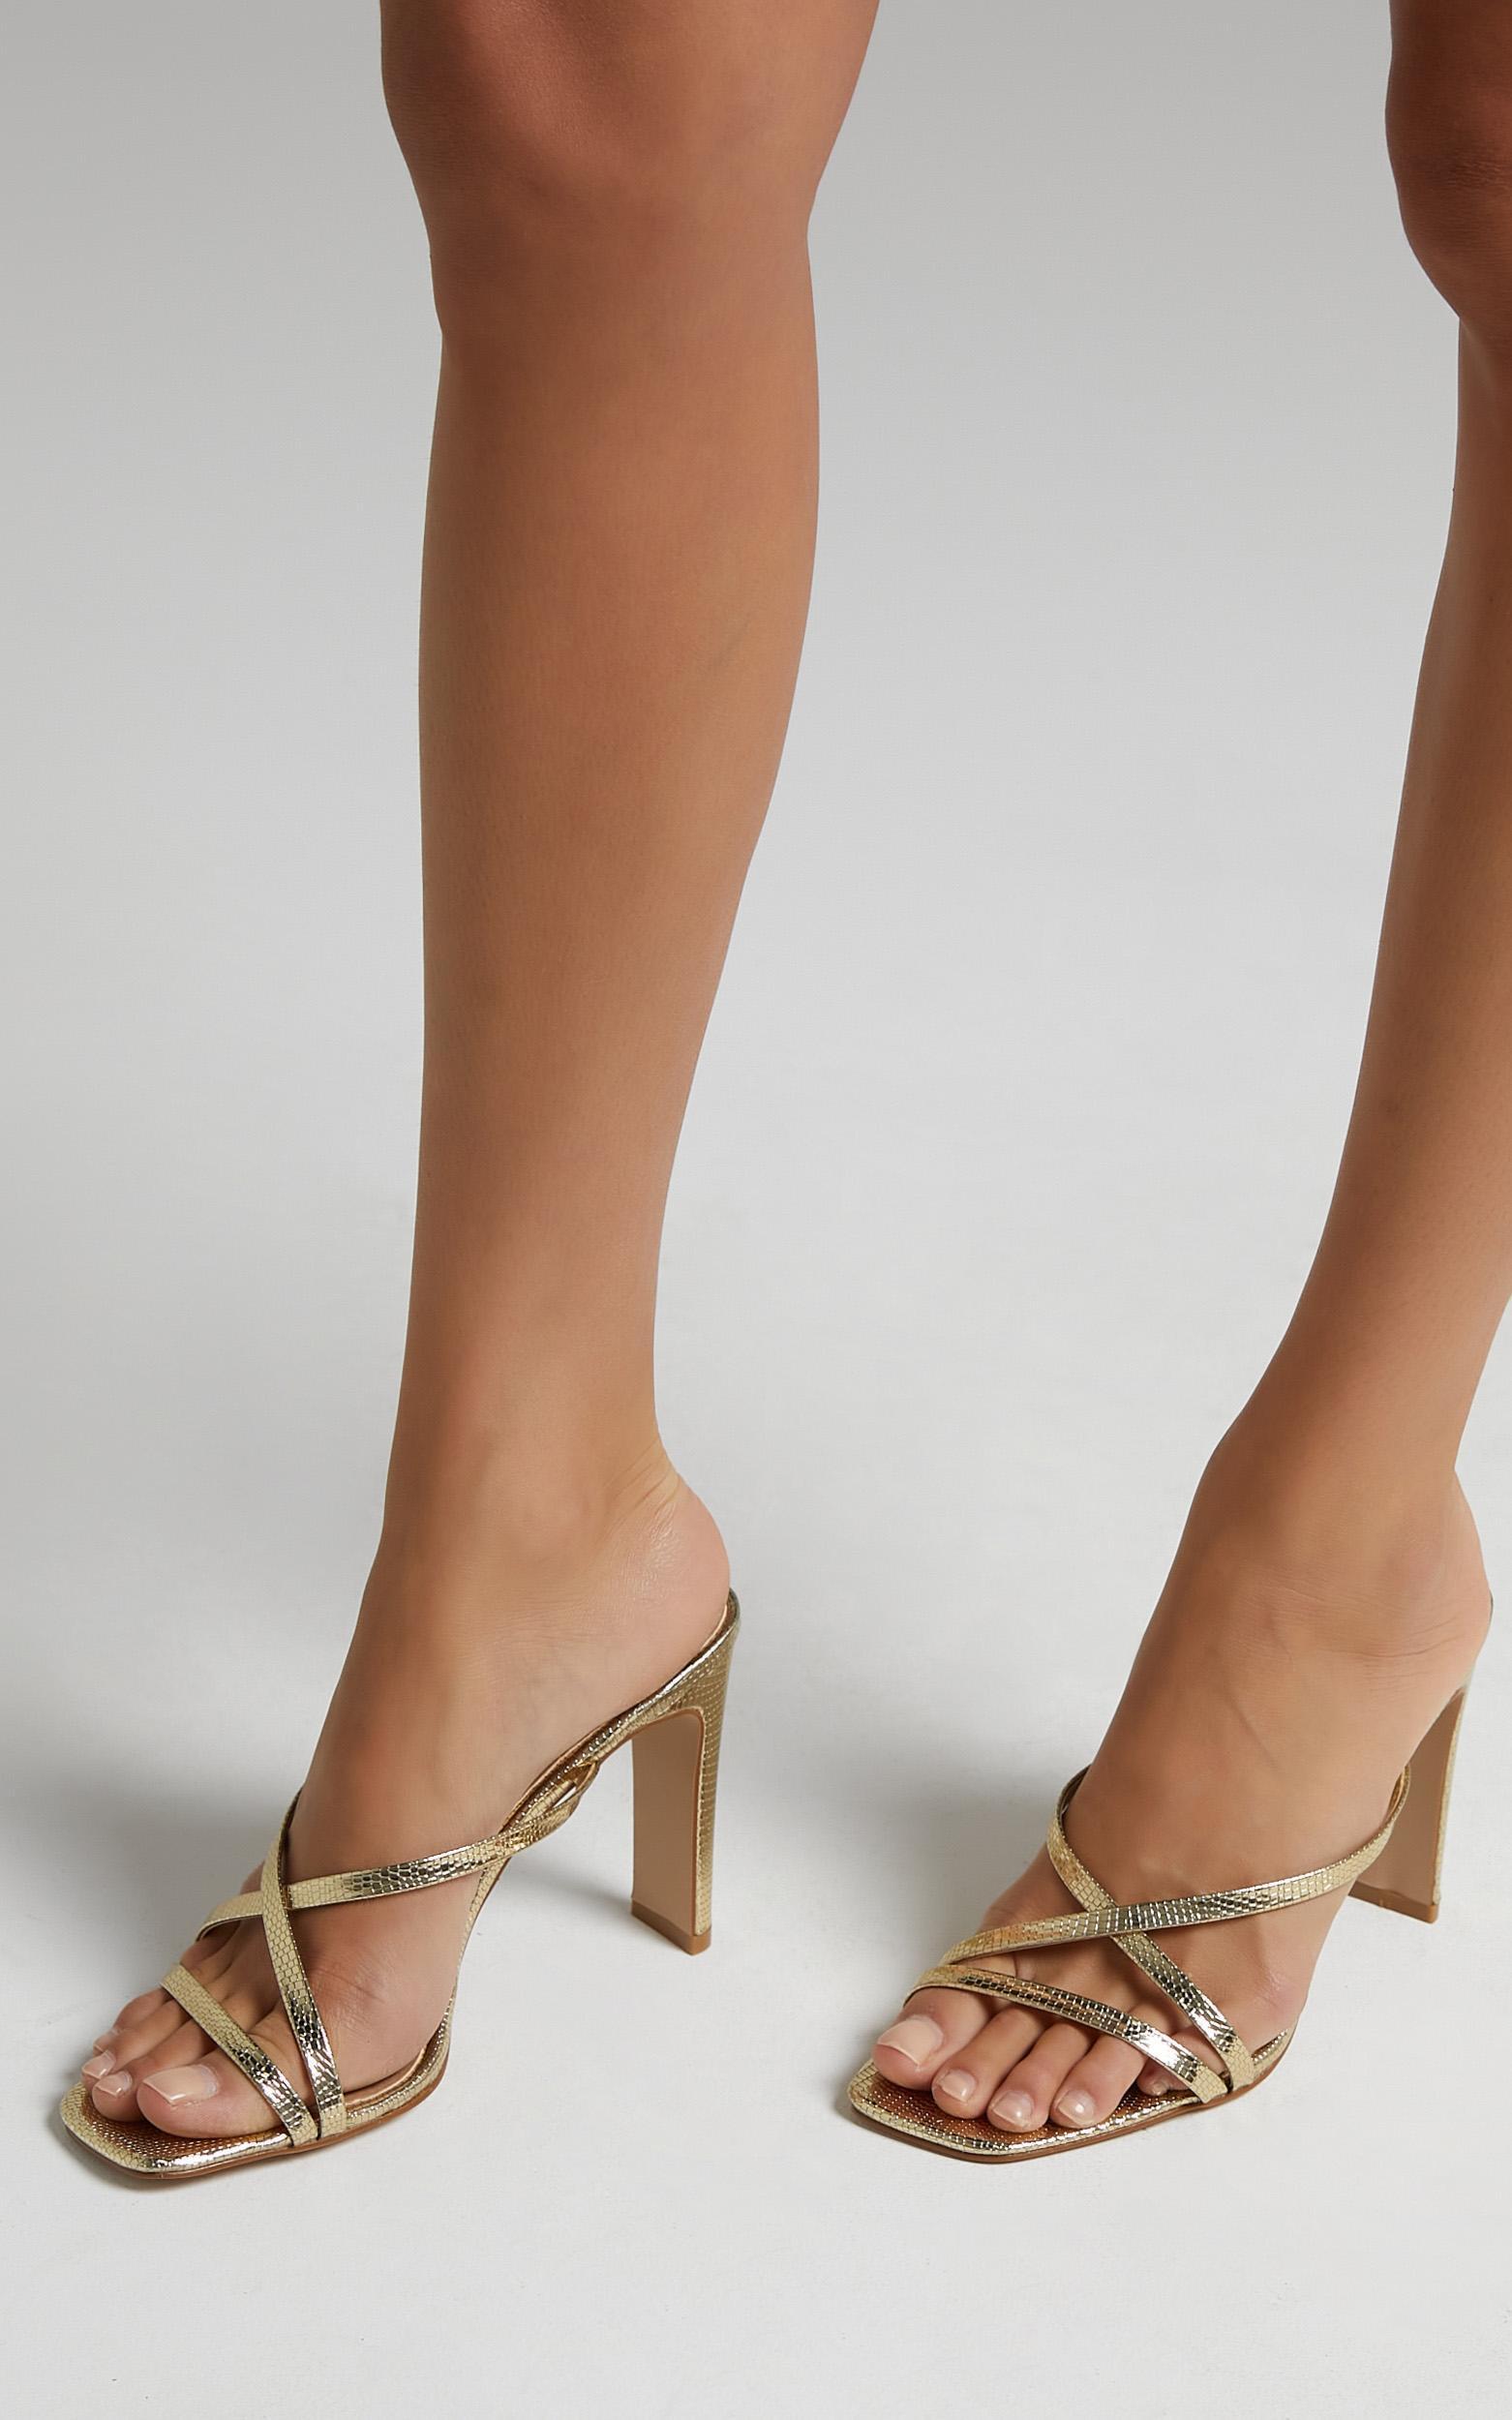 Billini - Guinevere Block Heels in Gold Metallic Scale - 5, Gold, hi-res image number null